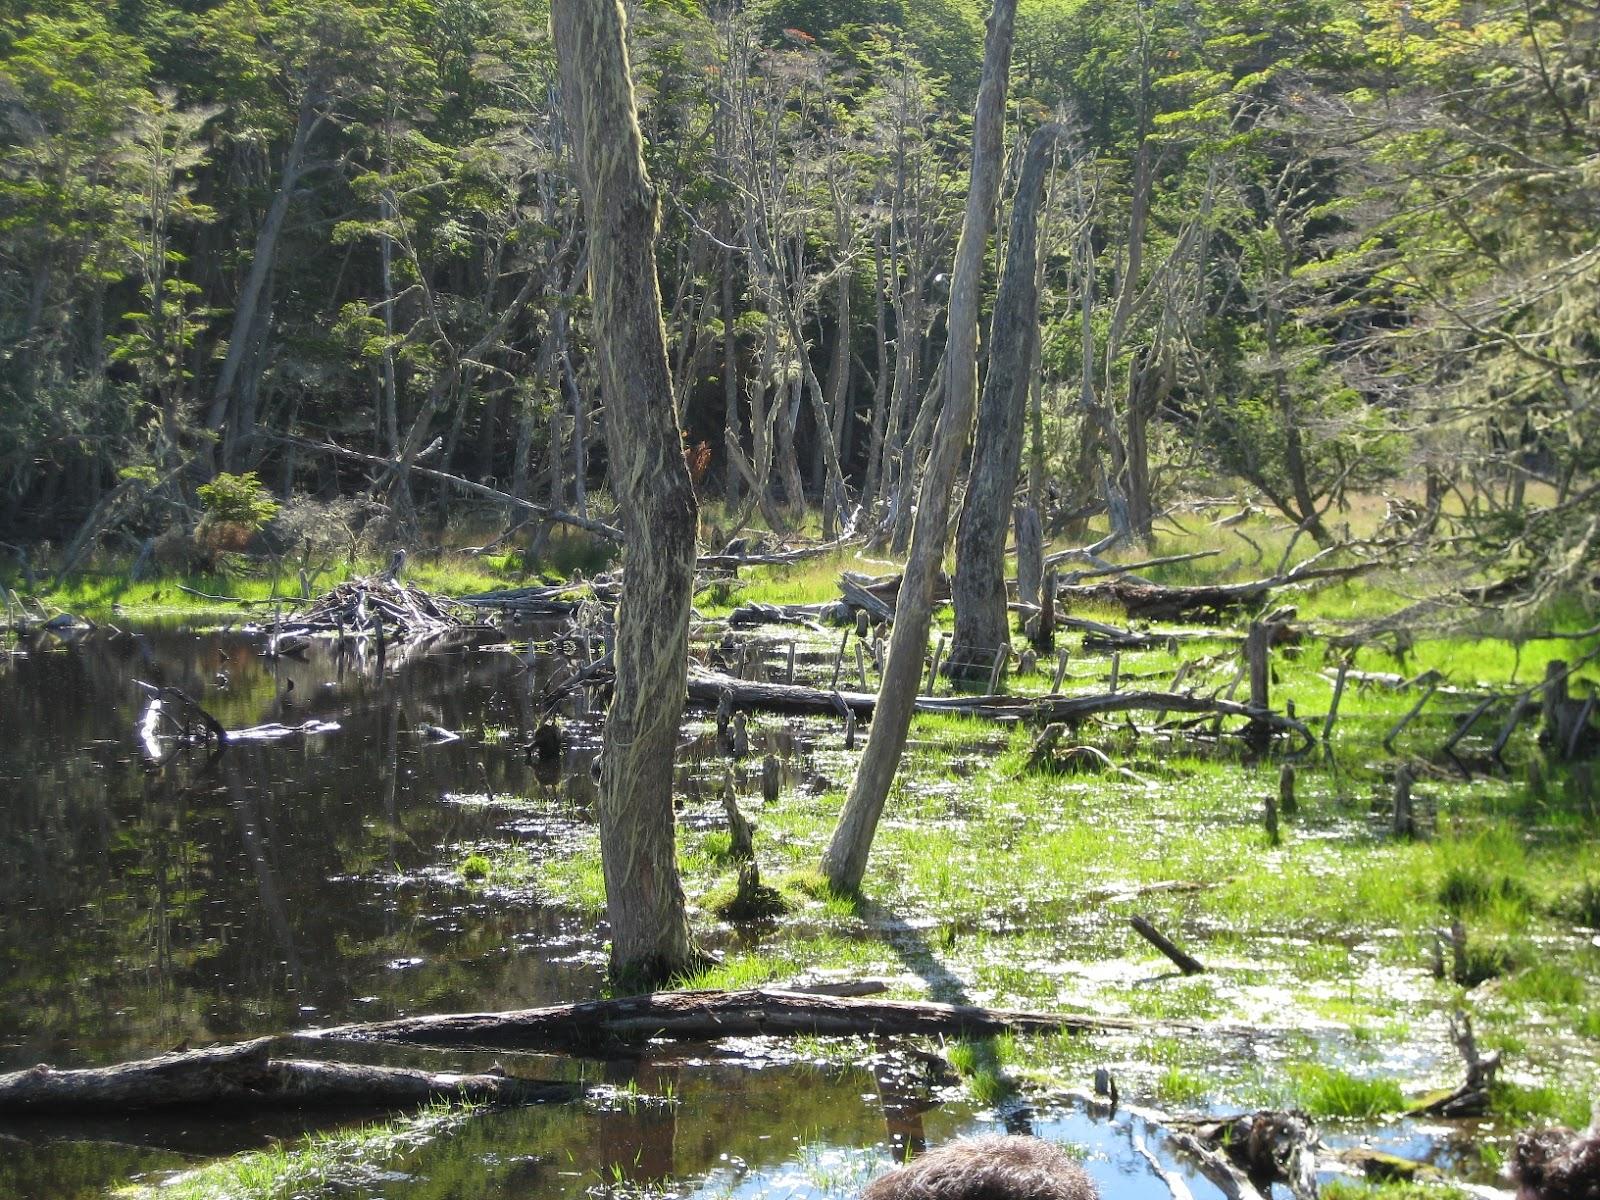 Beaver damage - flooded land, dead trees